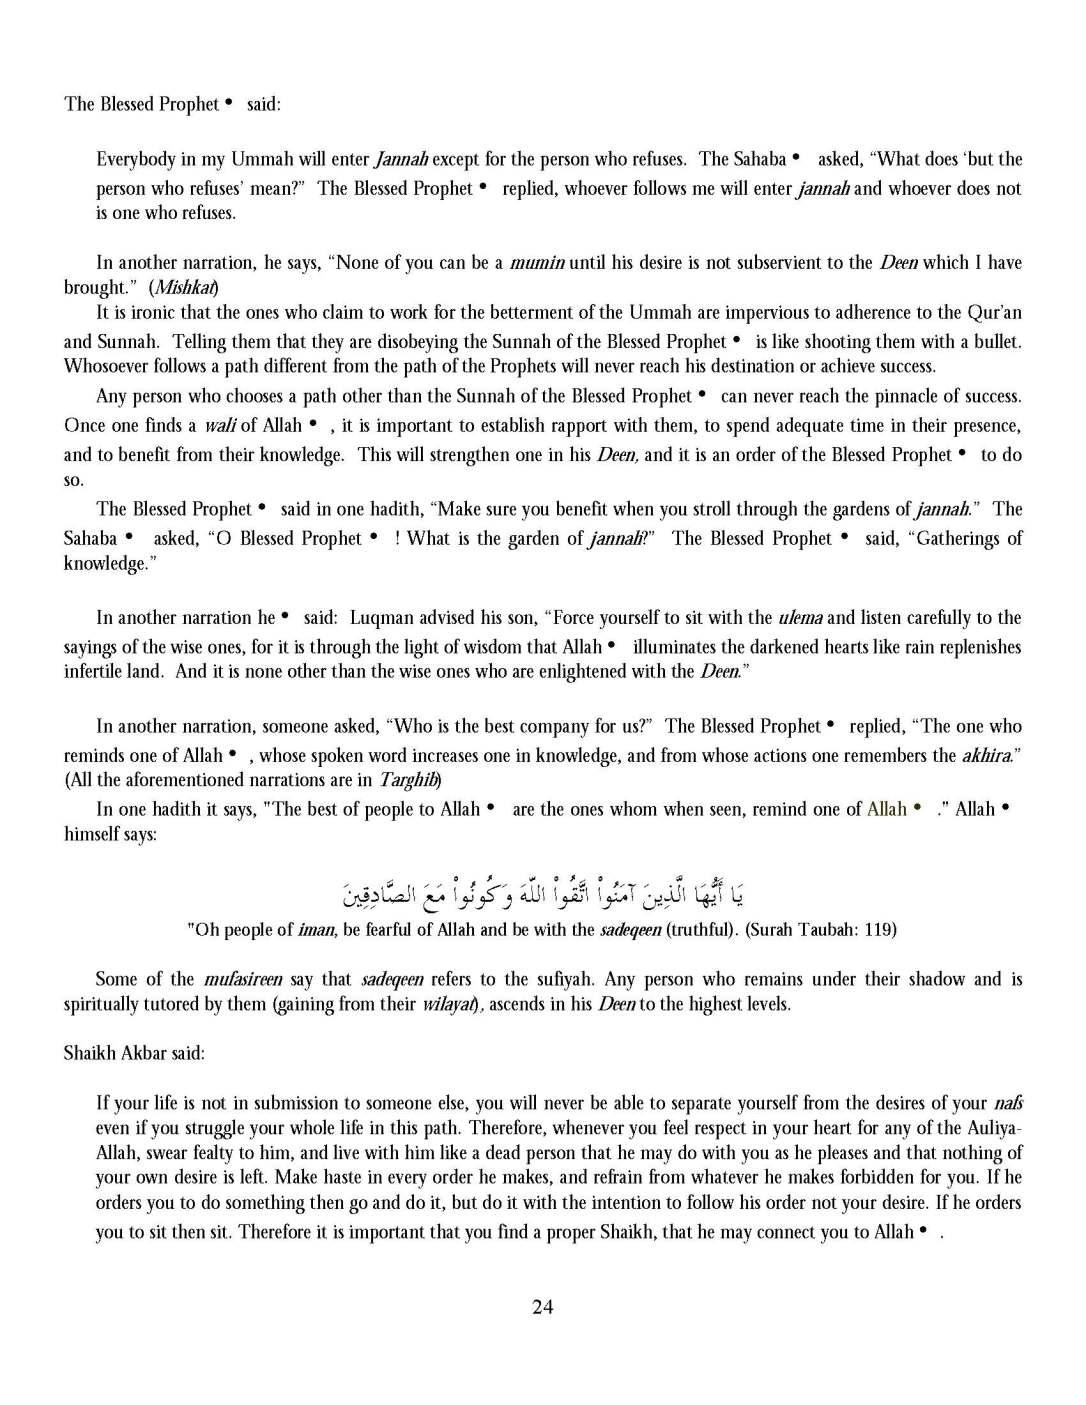 ConsequencesOfDebasingAuliyaAllah_Page_25